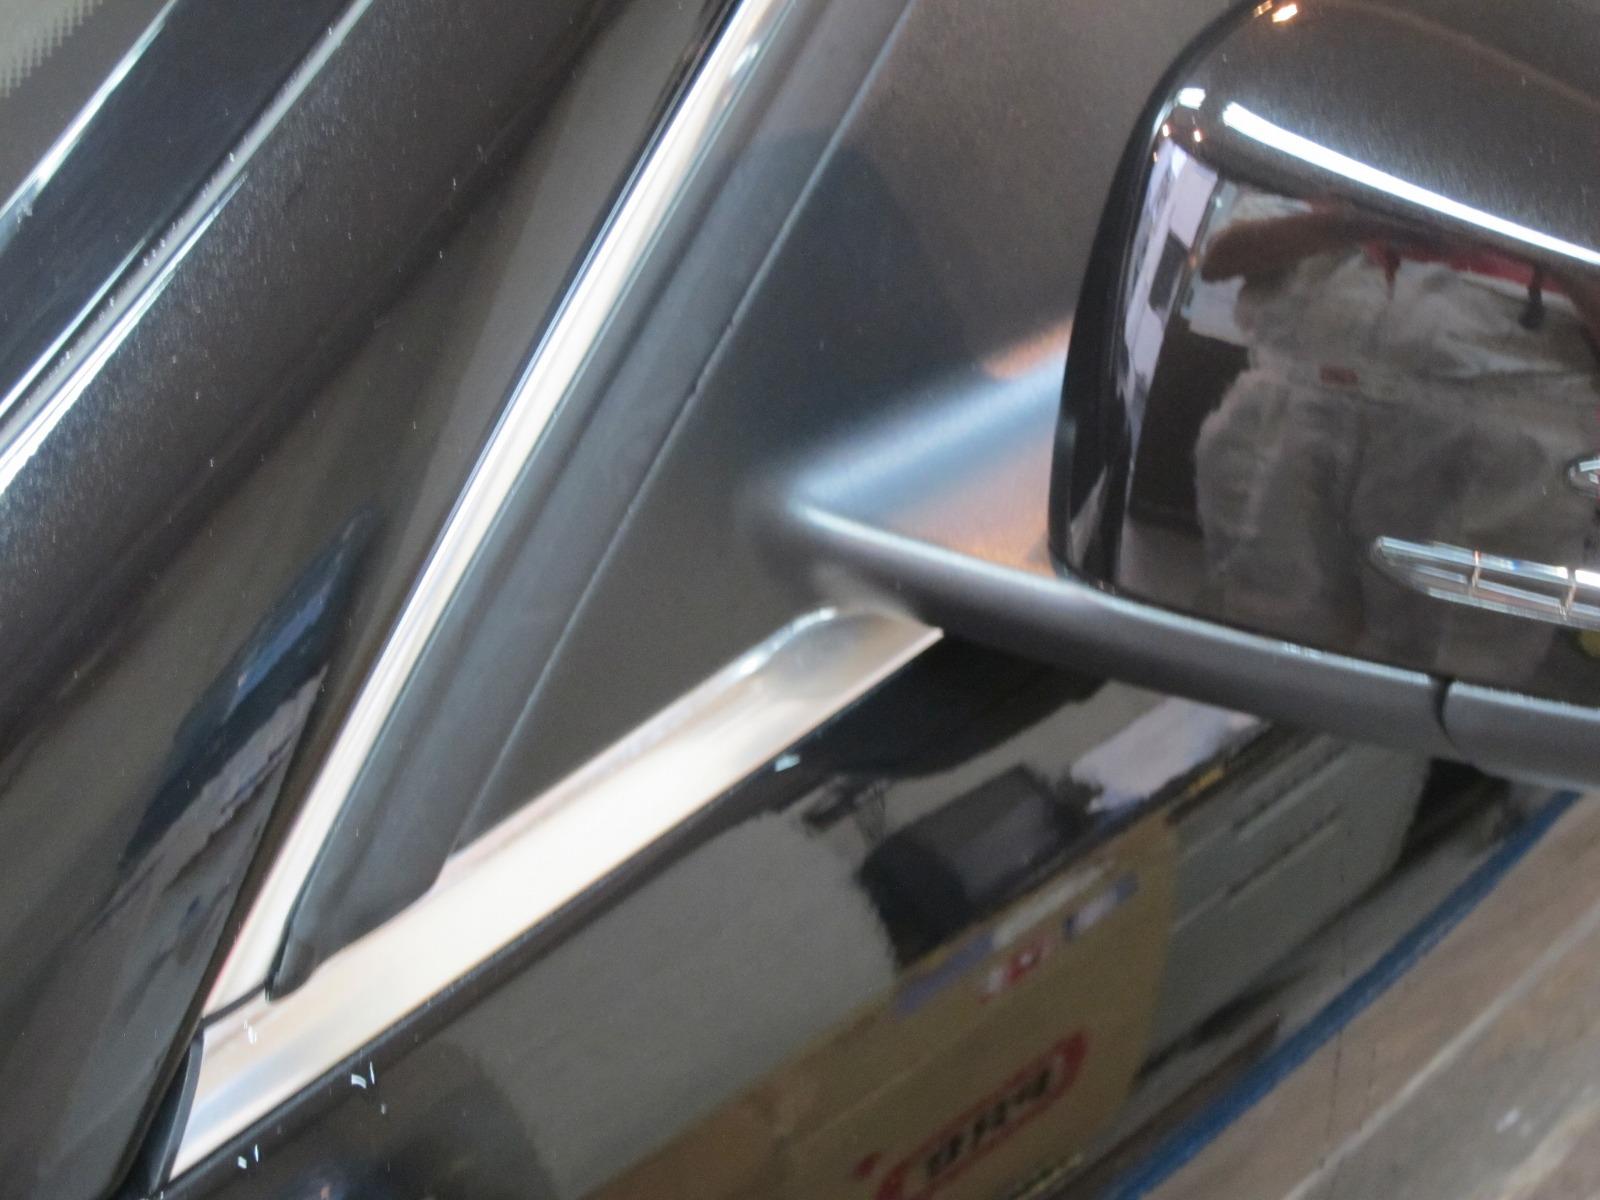 20130822-mercedes-benz-c200w-06